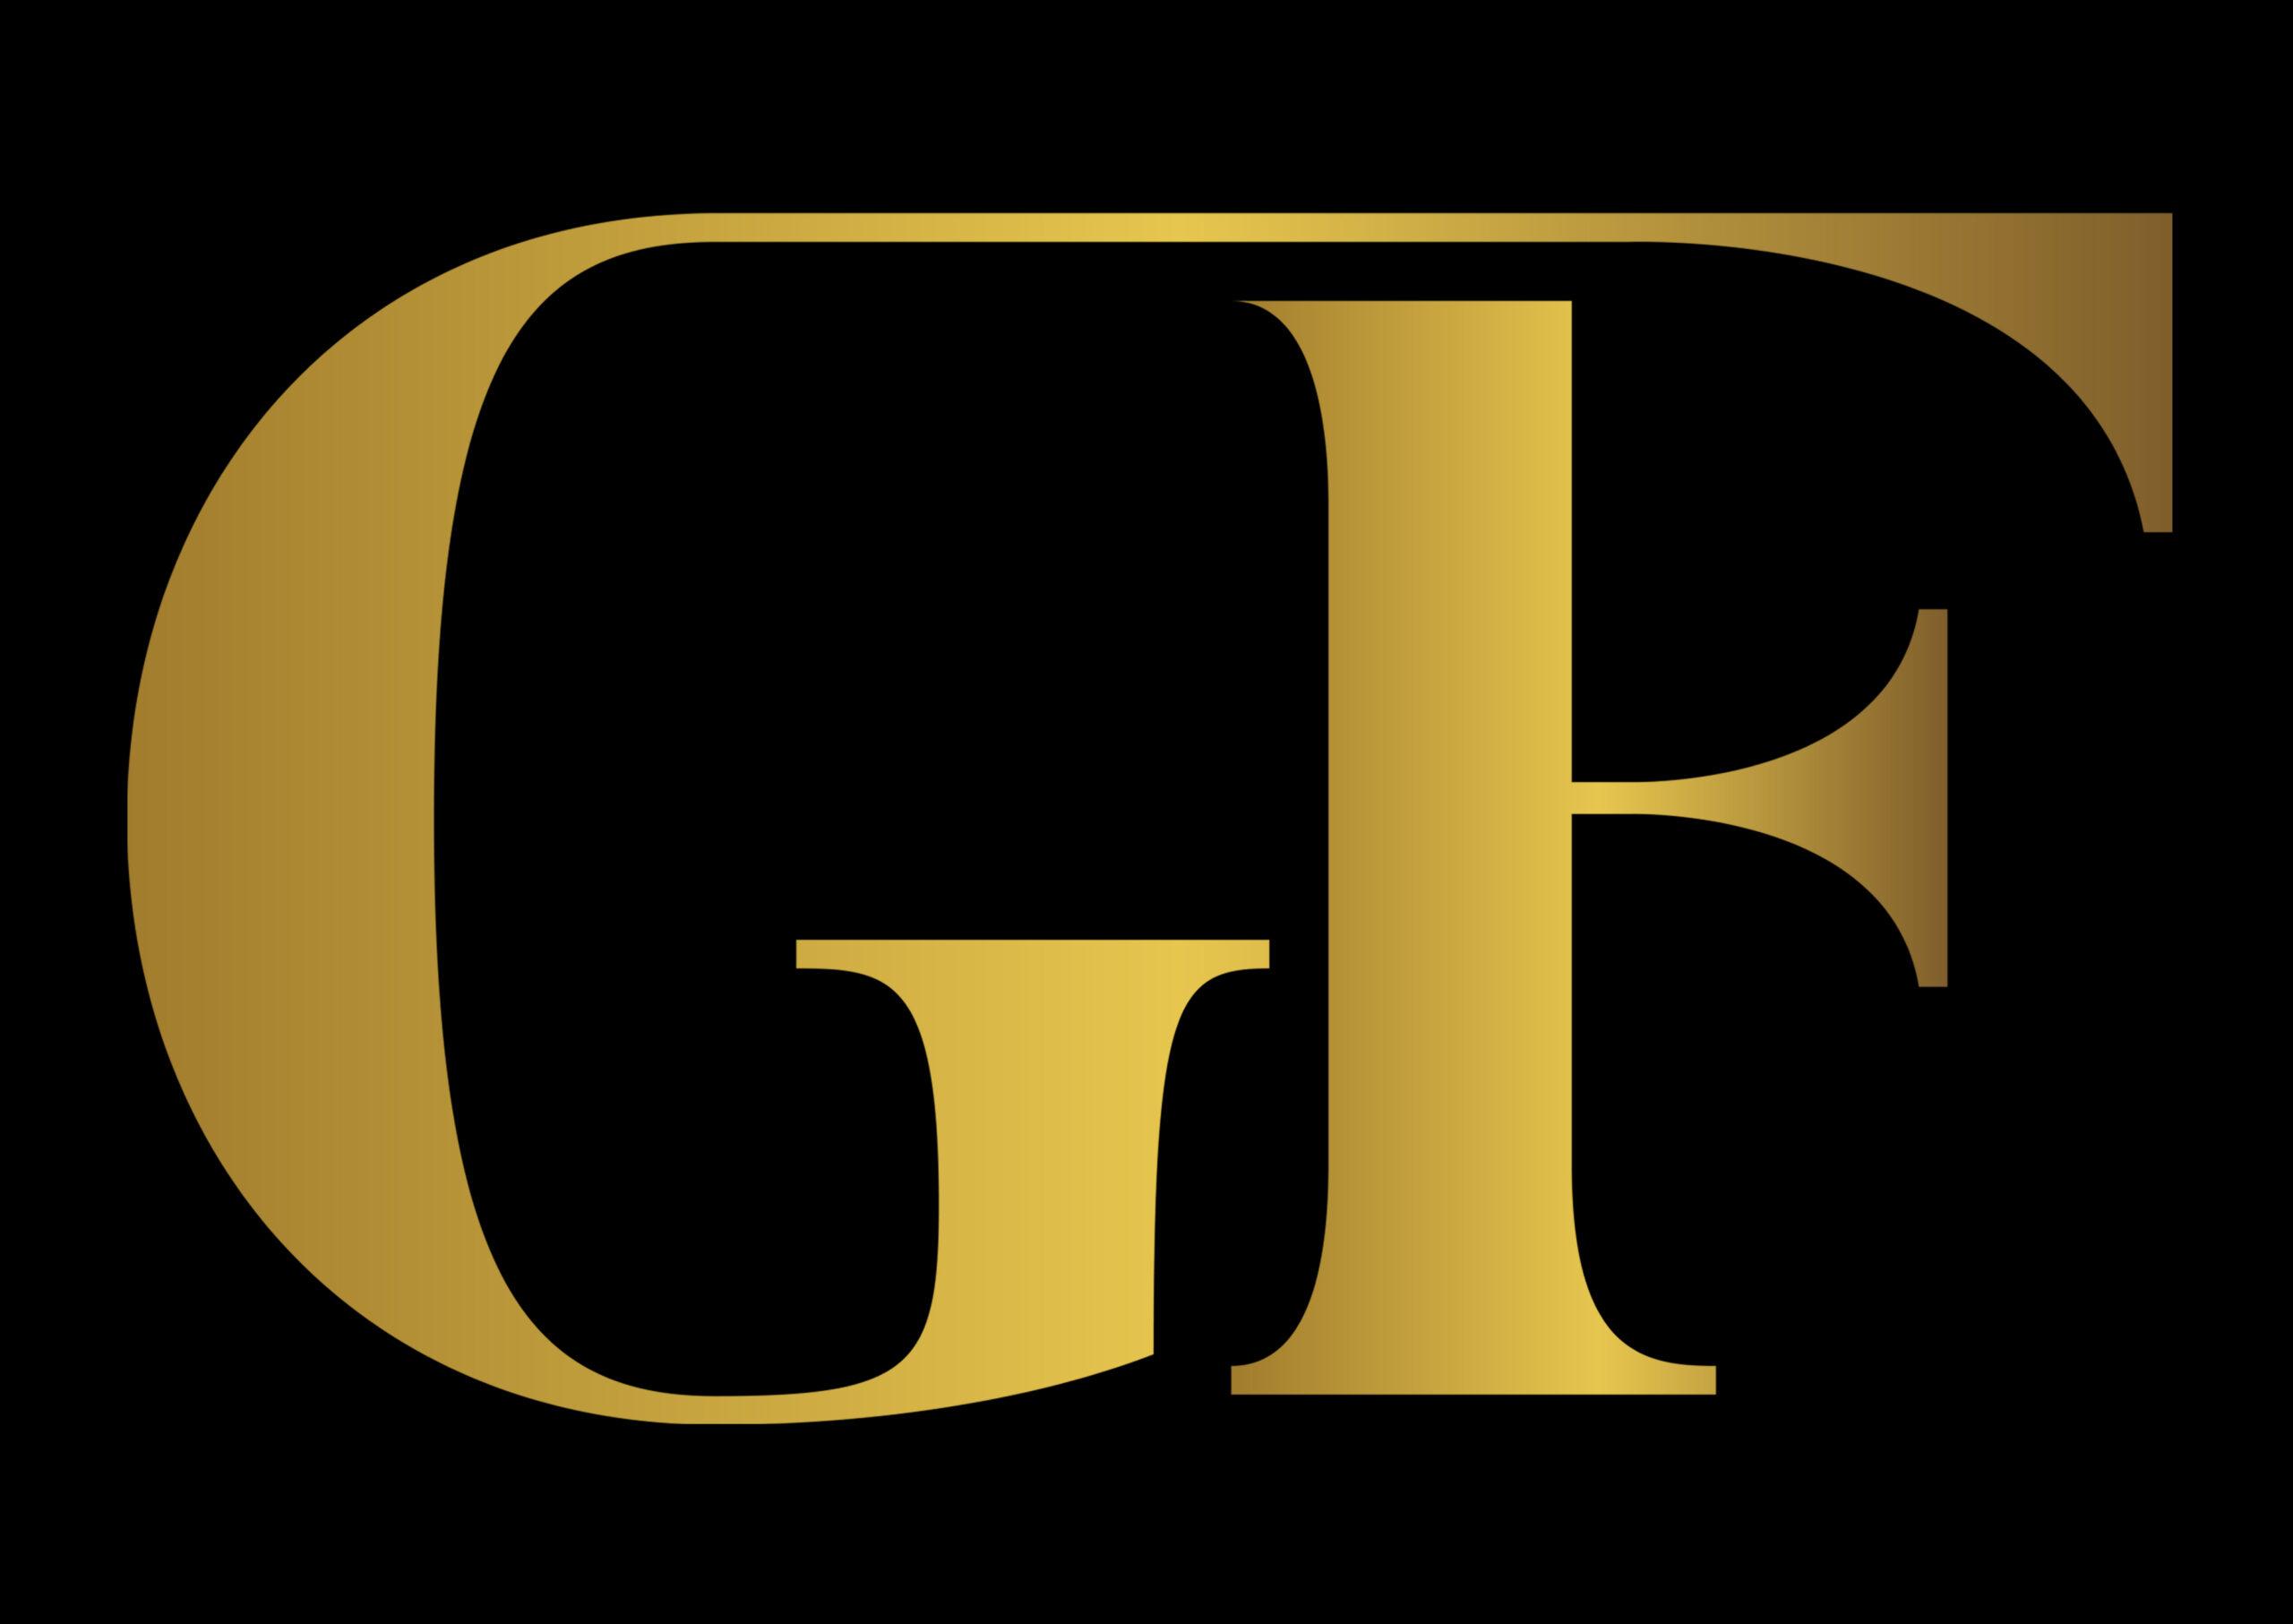 gmiand-logo-icon-dark